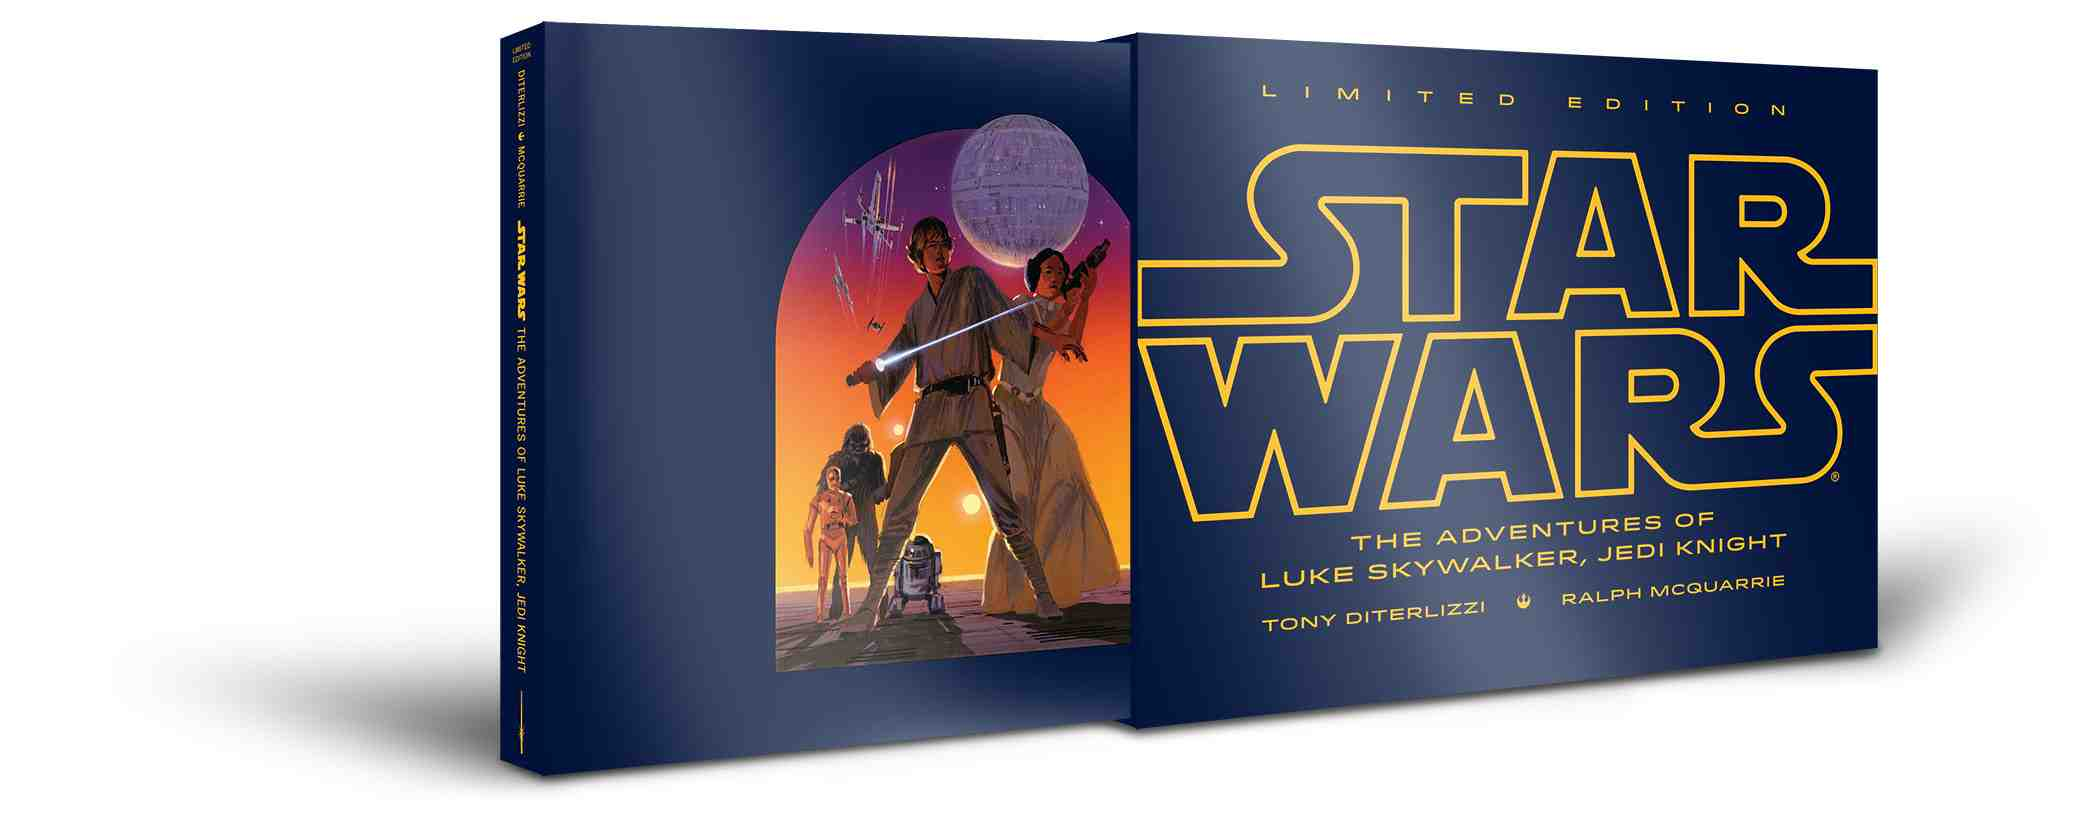 Star Wars: The Adventures of Luke Skywalker, Jedi Knight (Deluxe Edition)